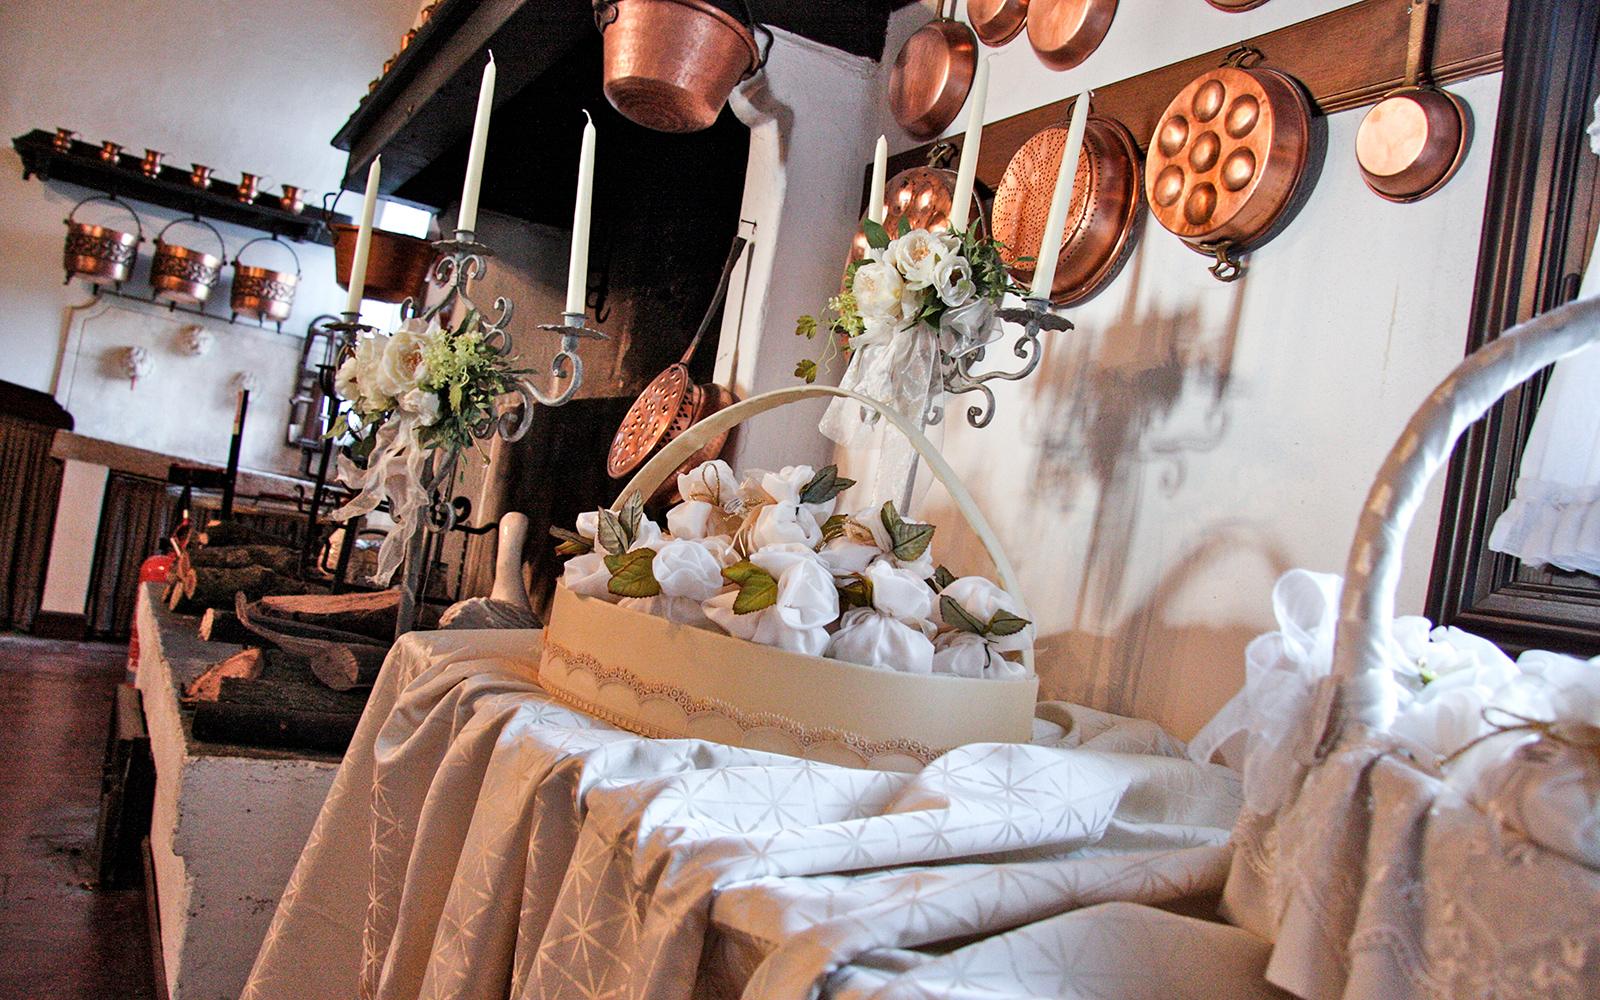 Vicenza ricevimento matrimonio Vicenza matrimonio ricevimento , villa per eventi, villa per eventi Vicenza, villa per eventi Padova